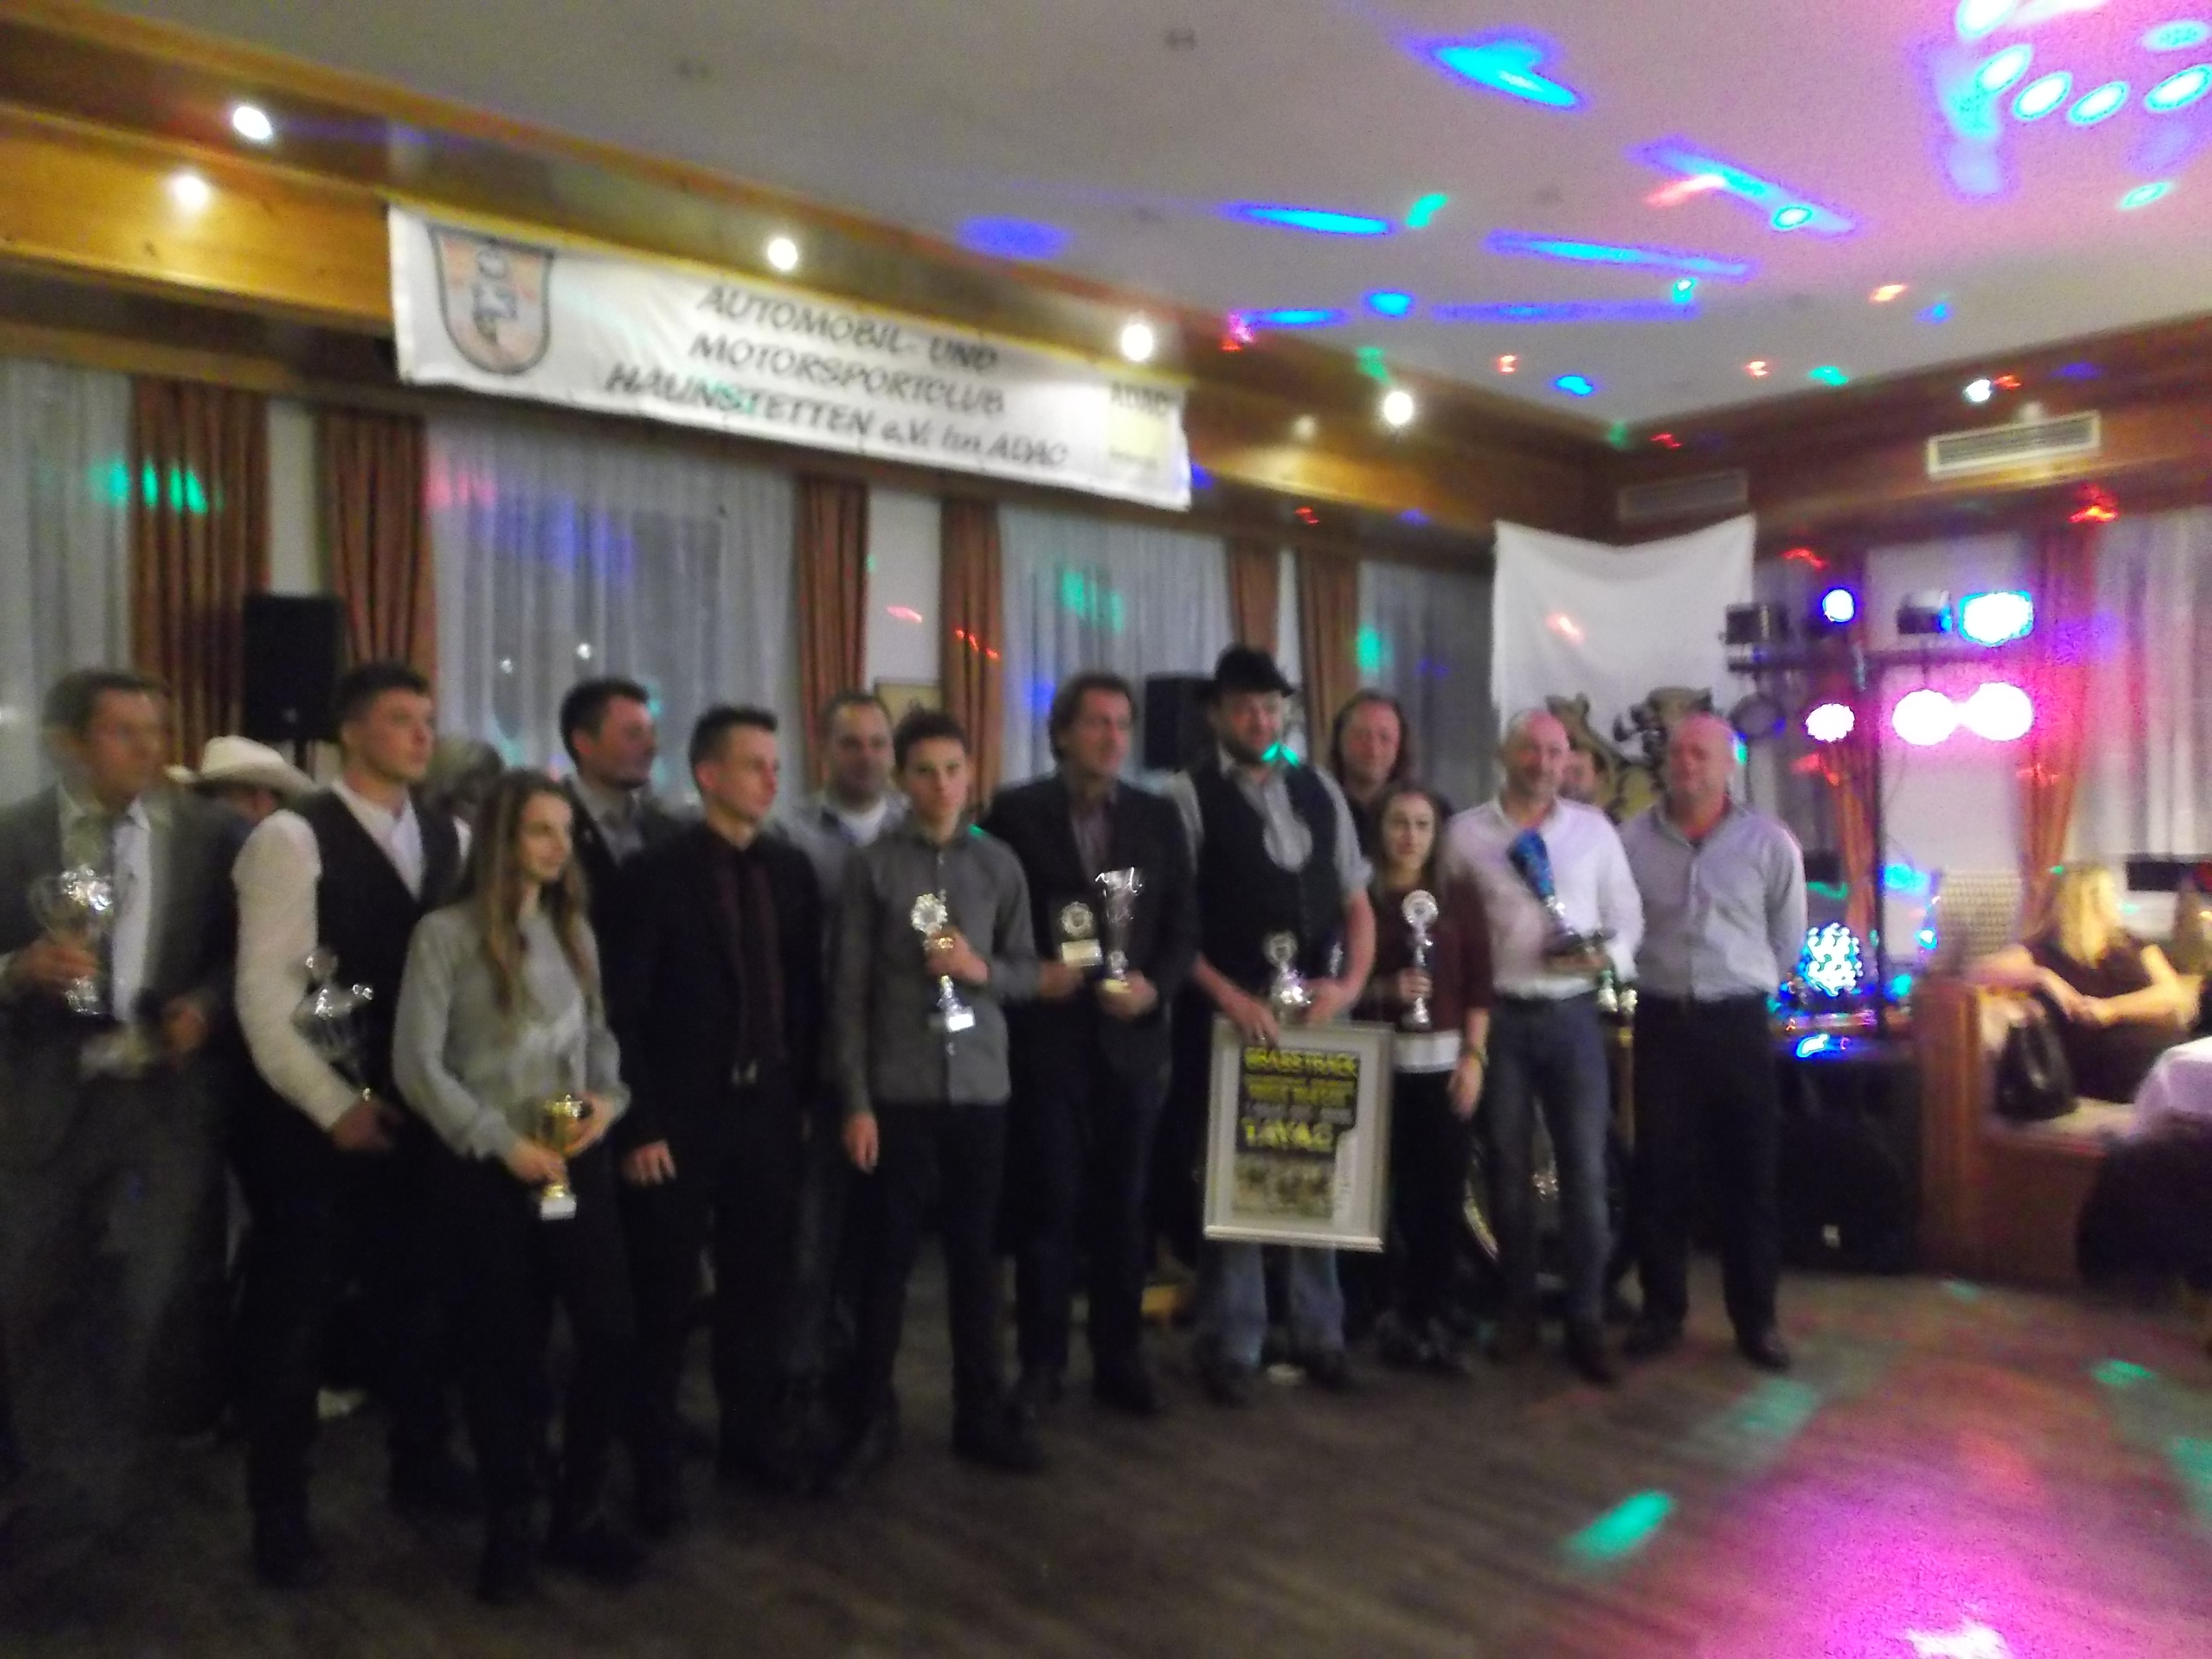 AMC Abschlussfeier 2017_36